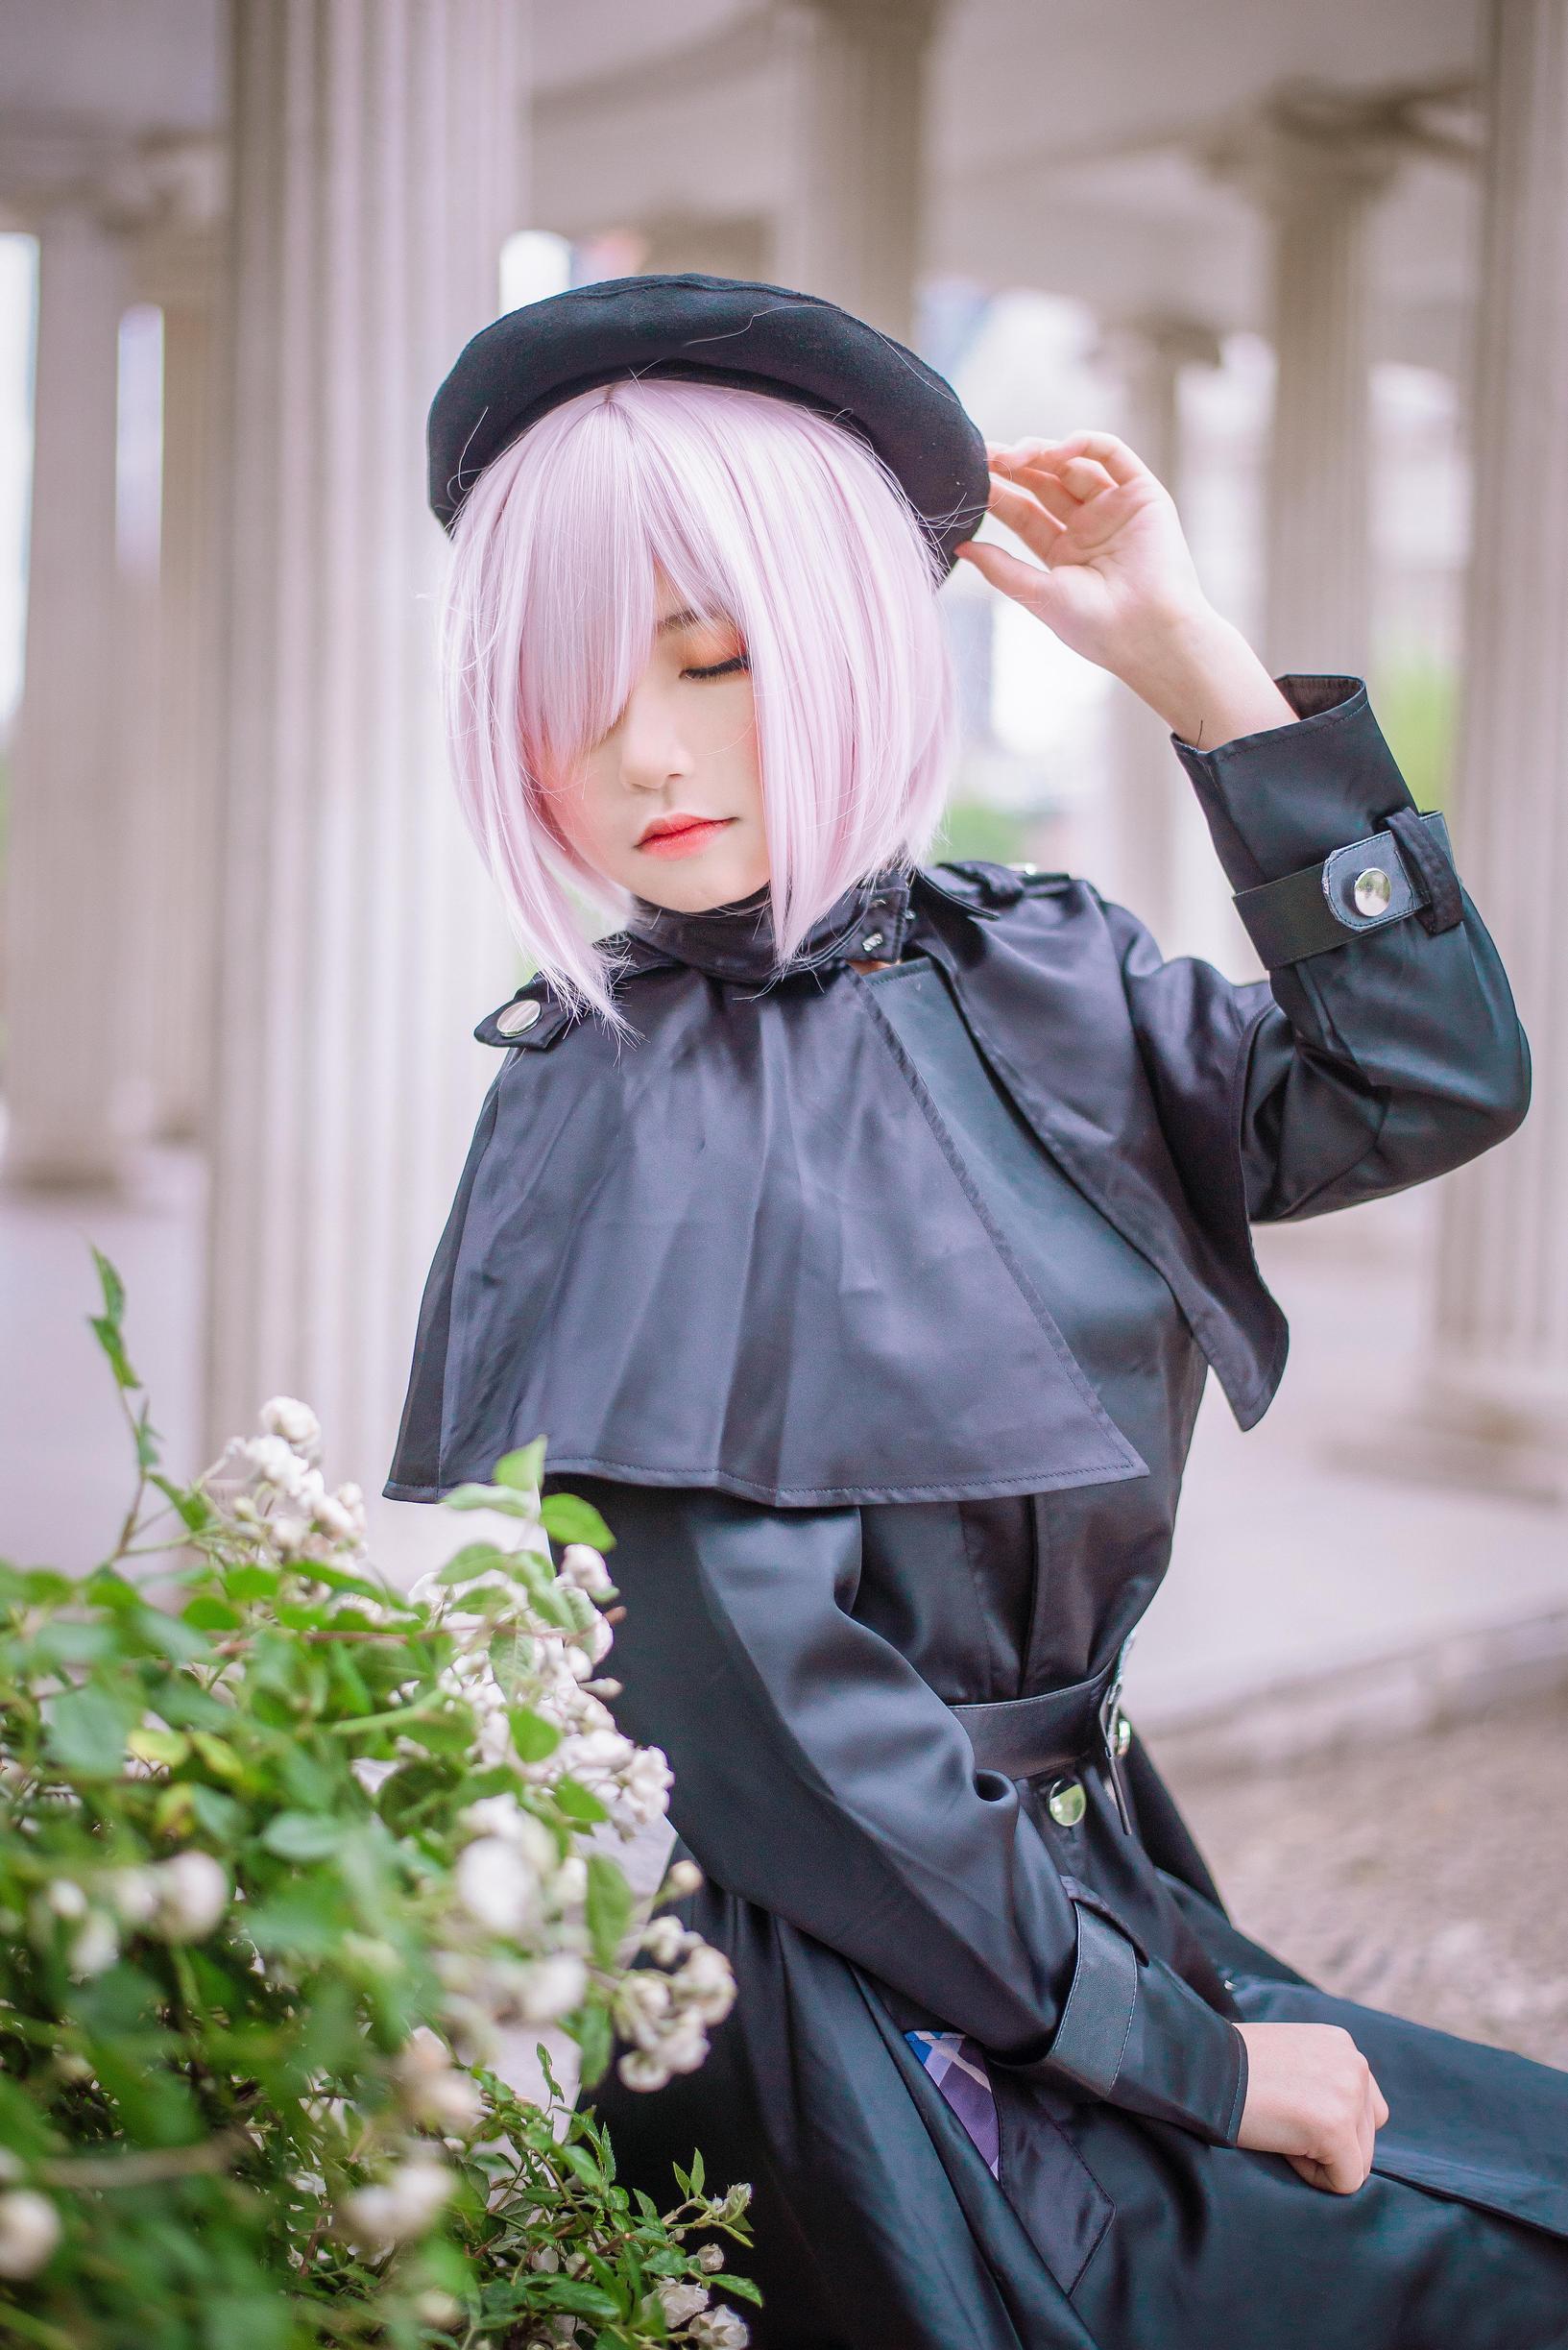 《FATE/GRAND ORDER》正片cosplay【CN:这个泡泡就是逊啦】-第5张